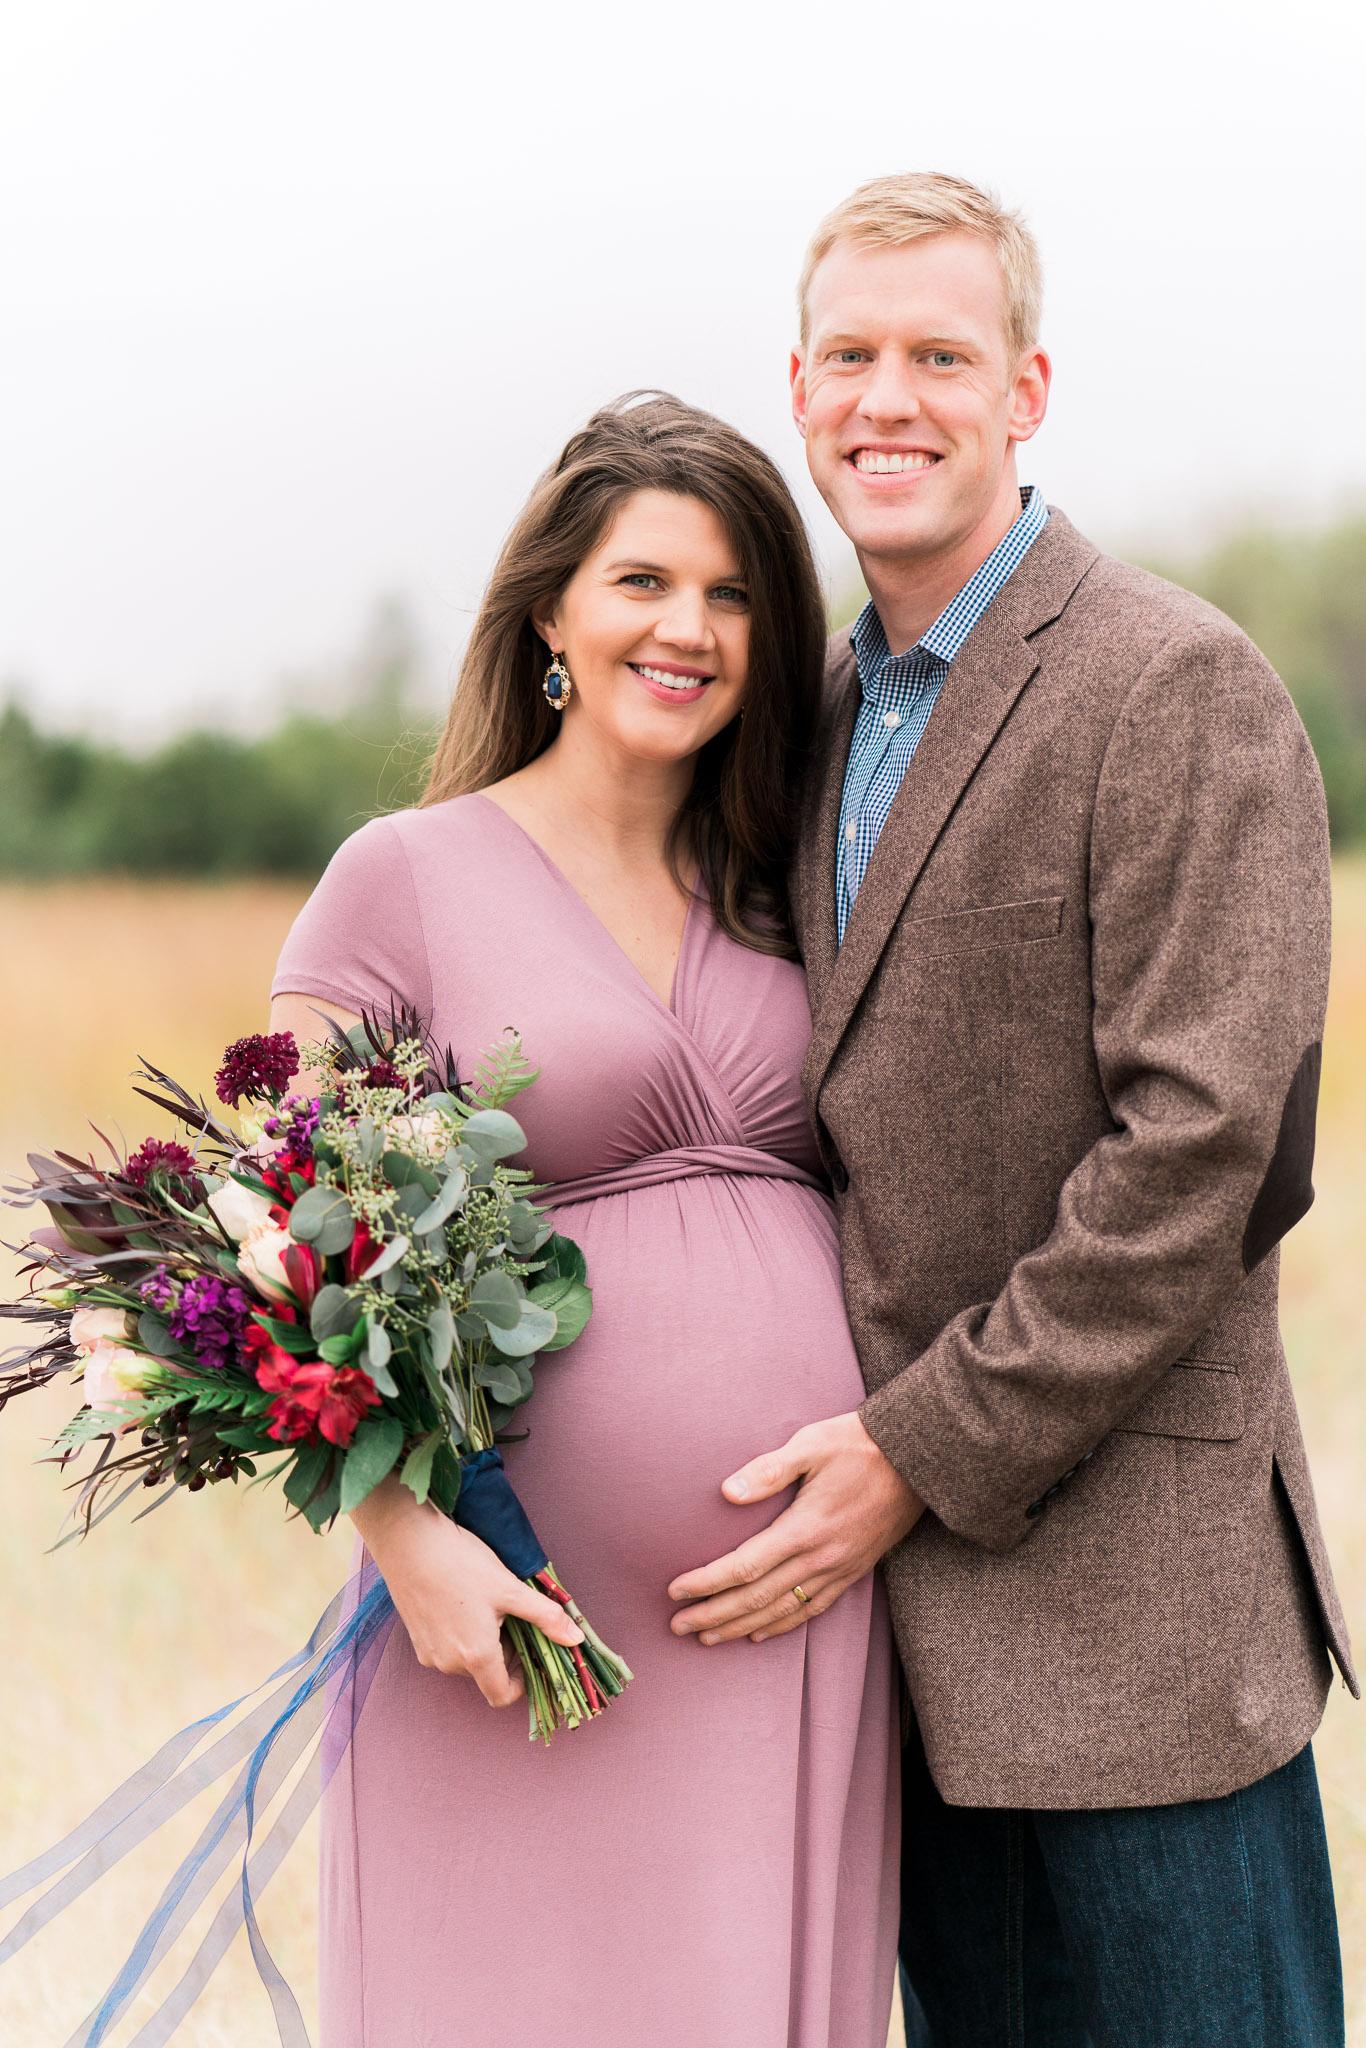 Lizanne-Andrew-Maternity-Kate-Bernard-Photography-Web-9.jpg